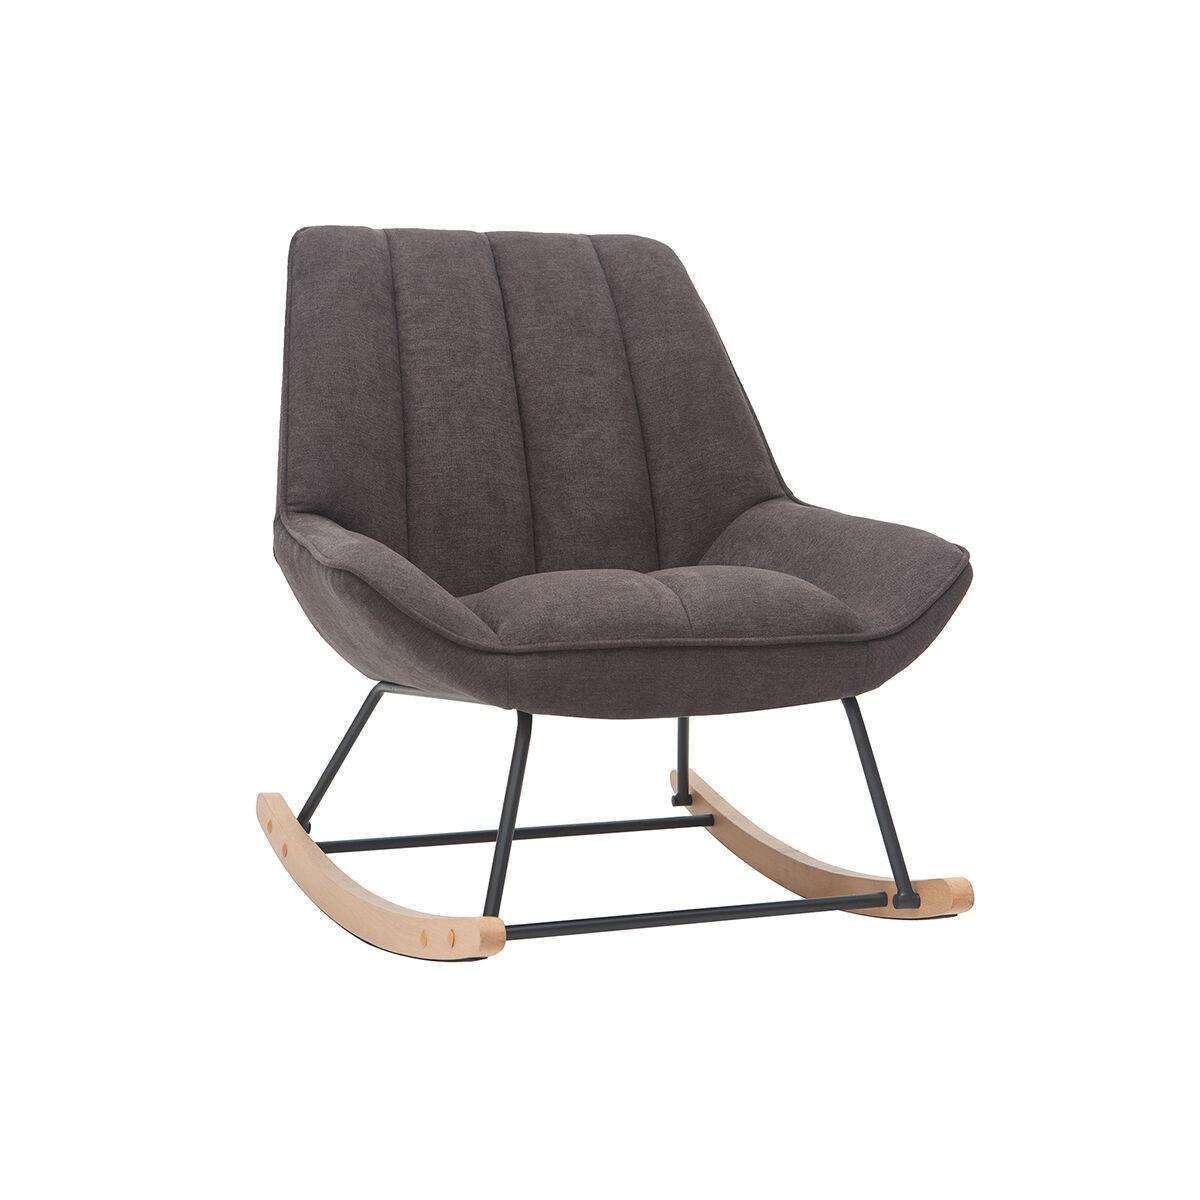 Miliboo Rocking chair design en tissu effet velours gris foncé BILLIE